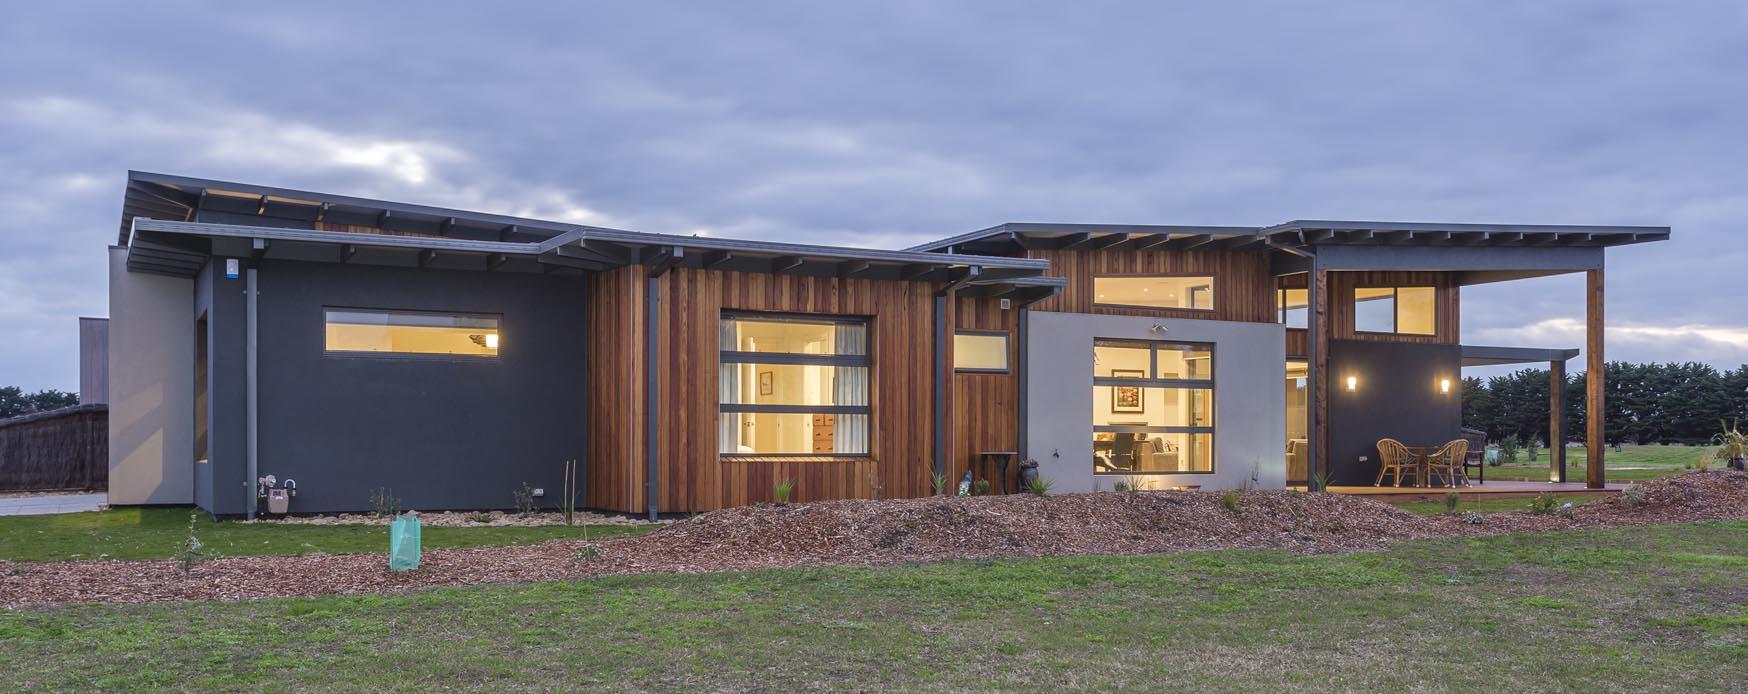 Single storey home designs pivot homes for Pivot home designs